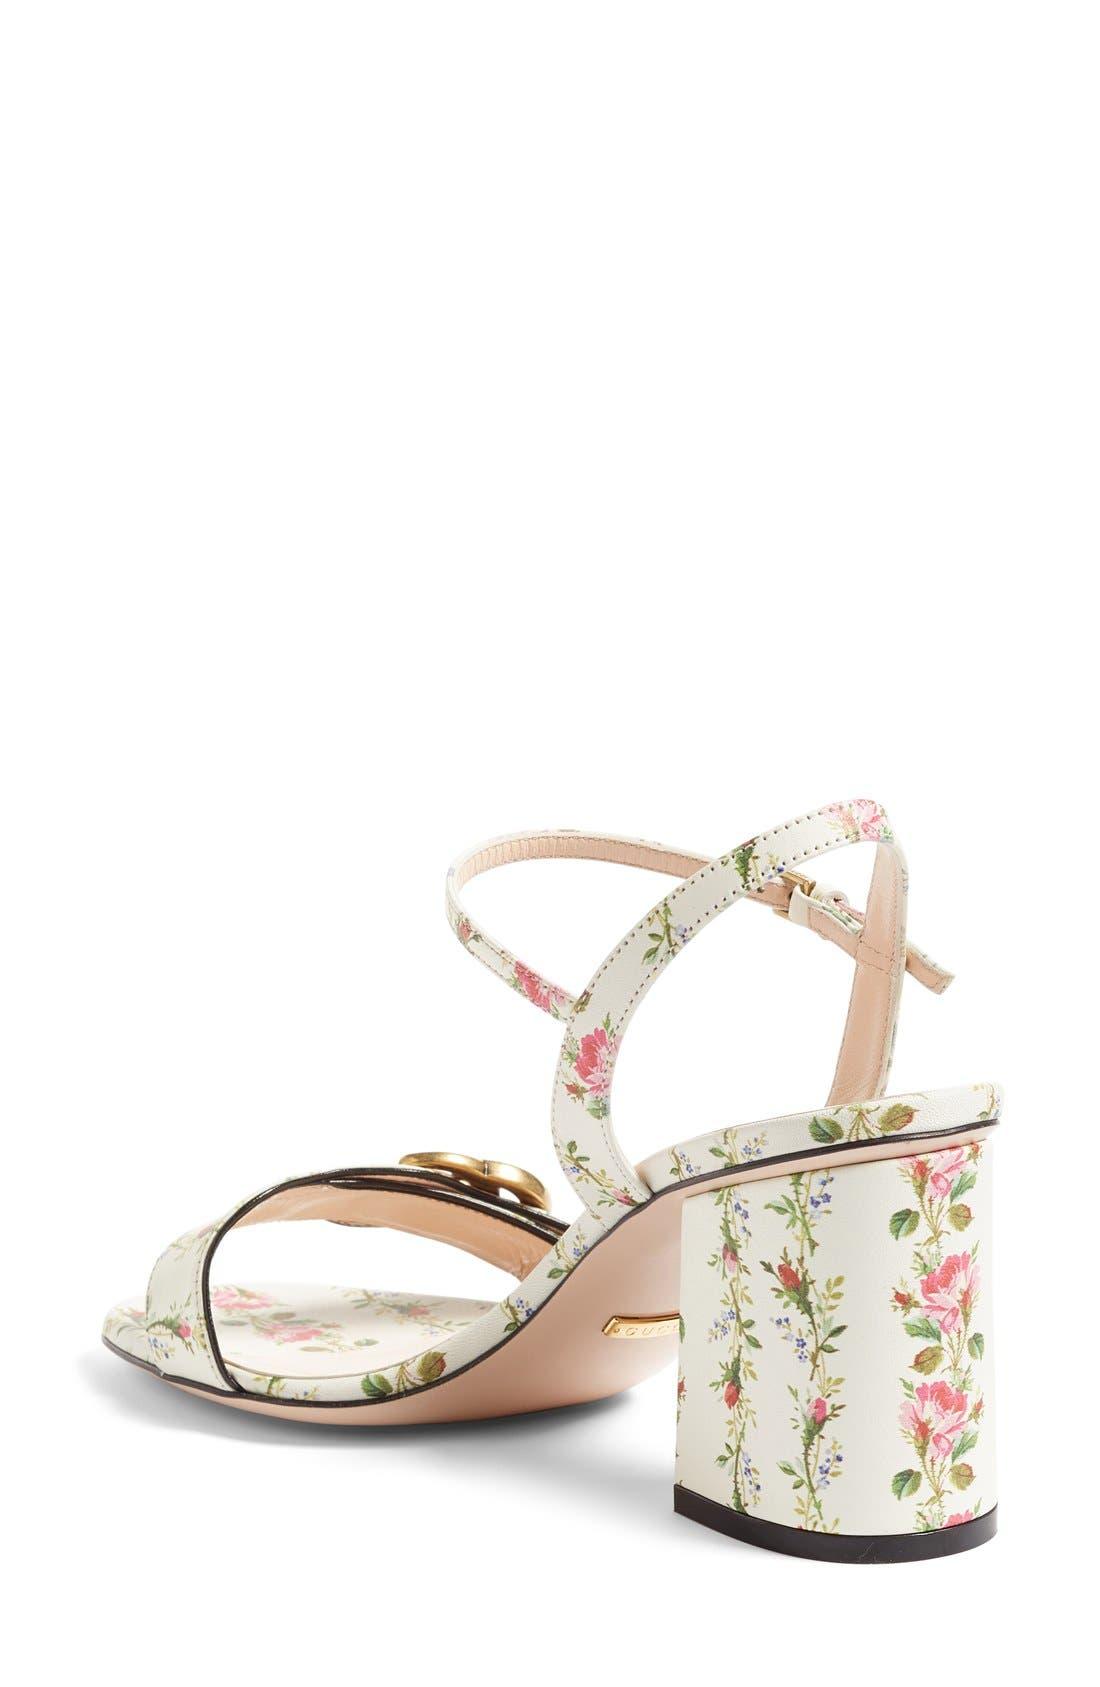 GG Marmont Block Heel Sandal,                             Alternate thumbnail 2, color,                             White Floral